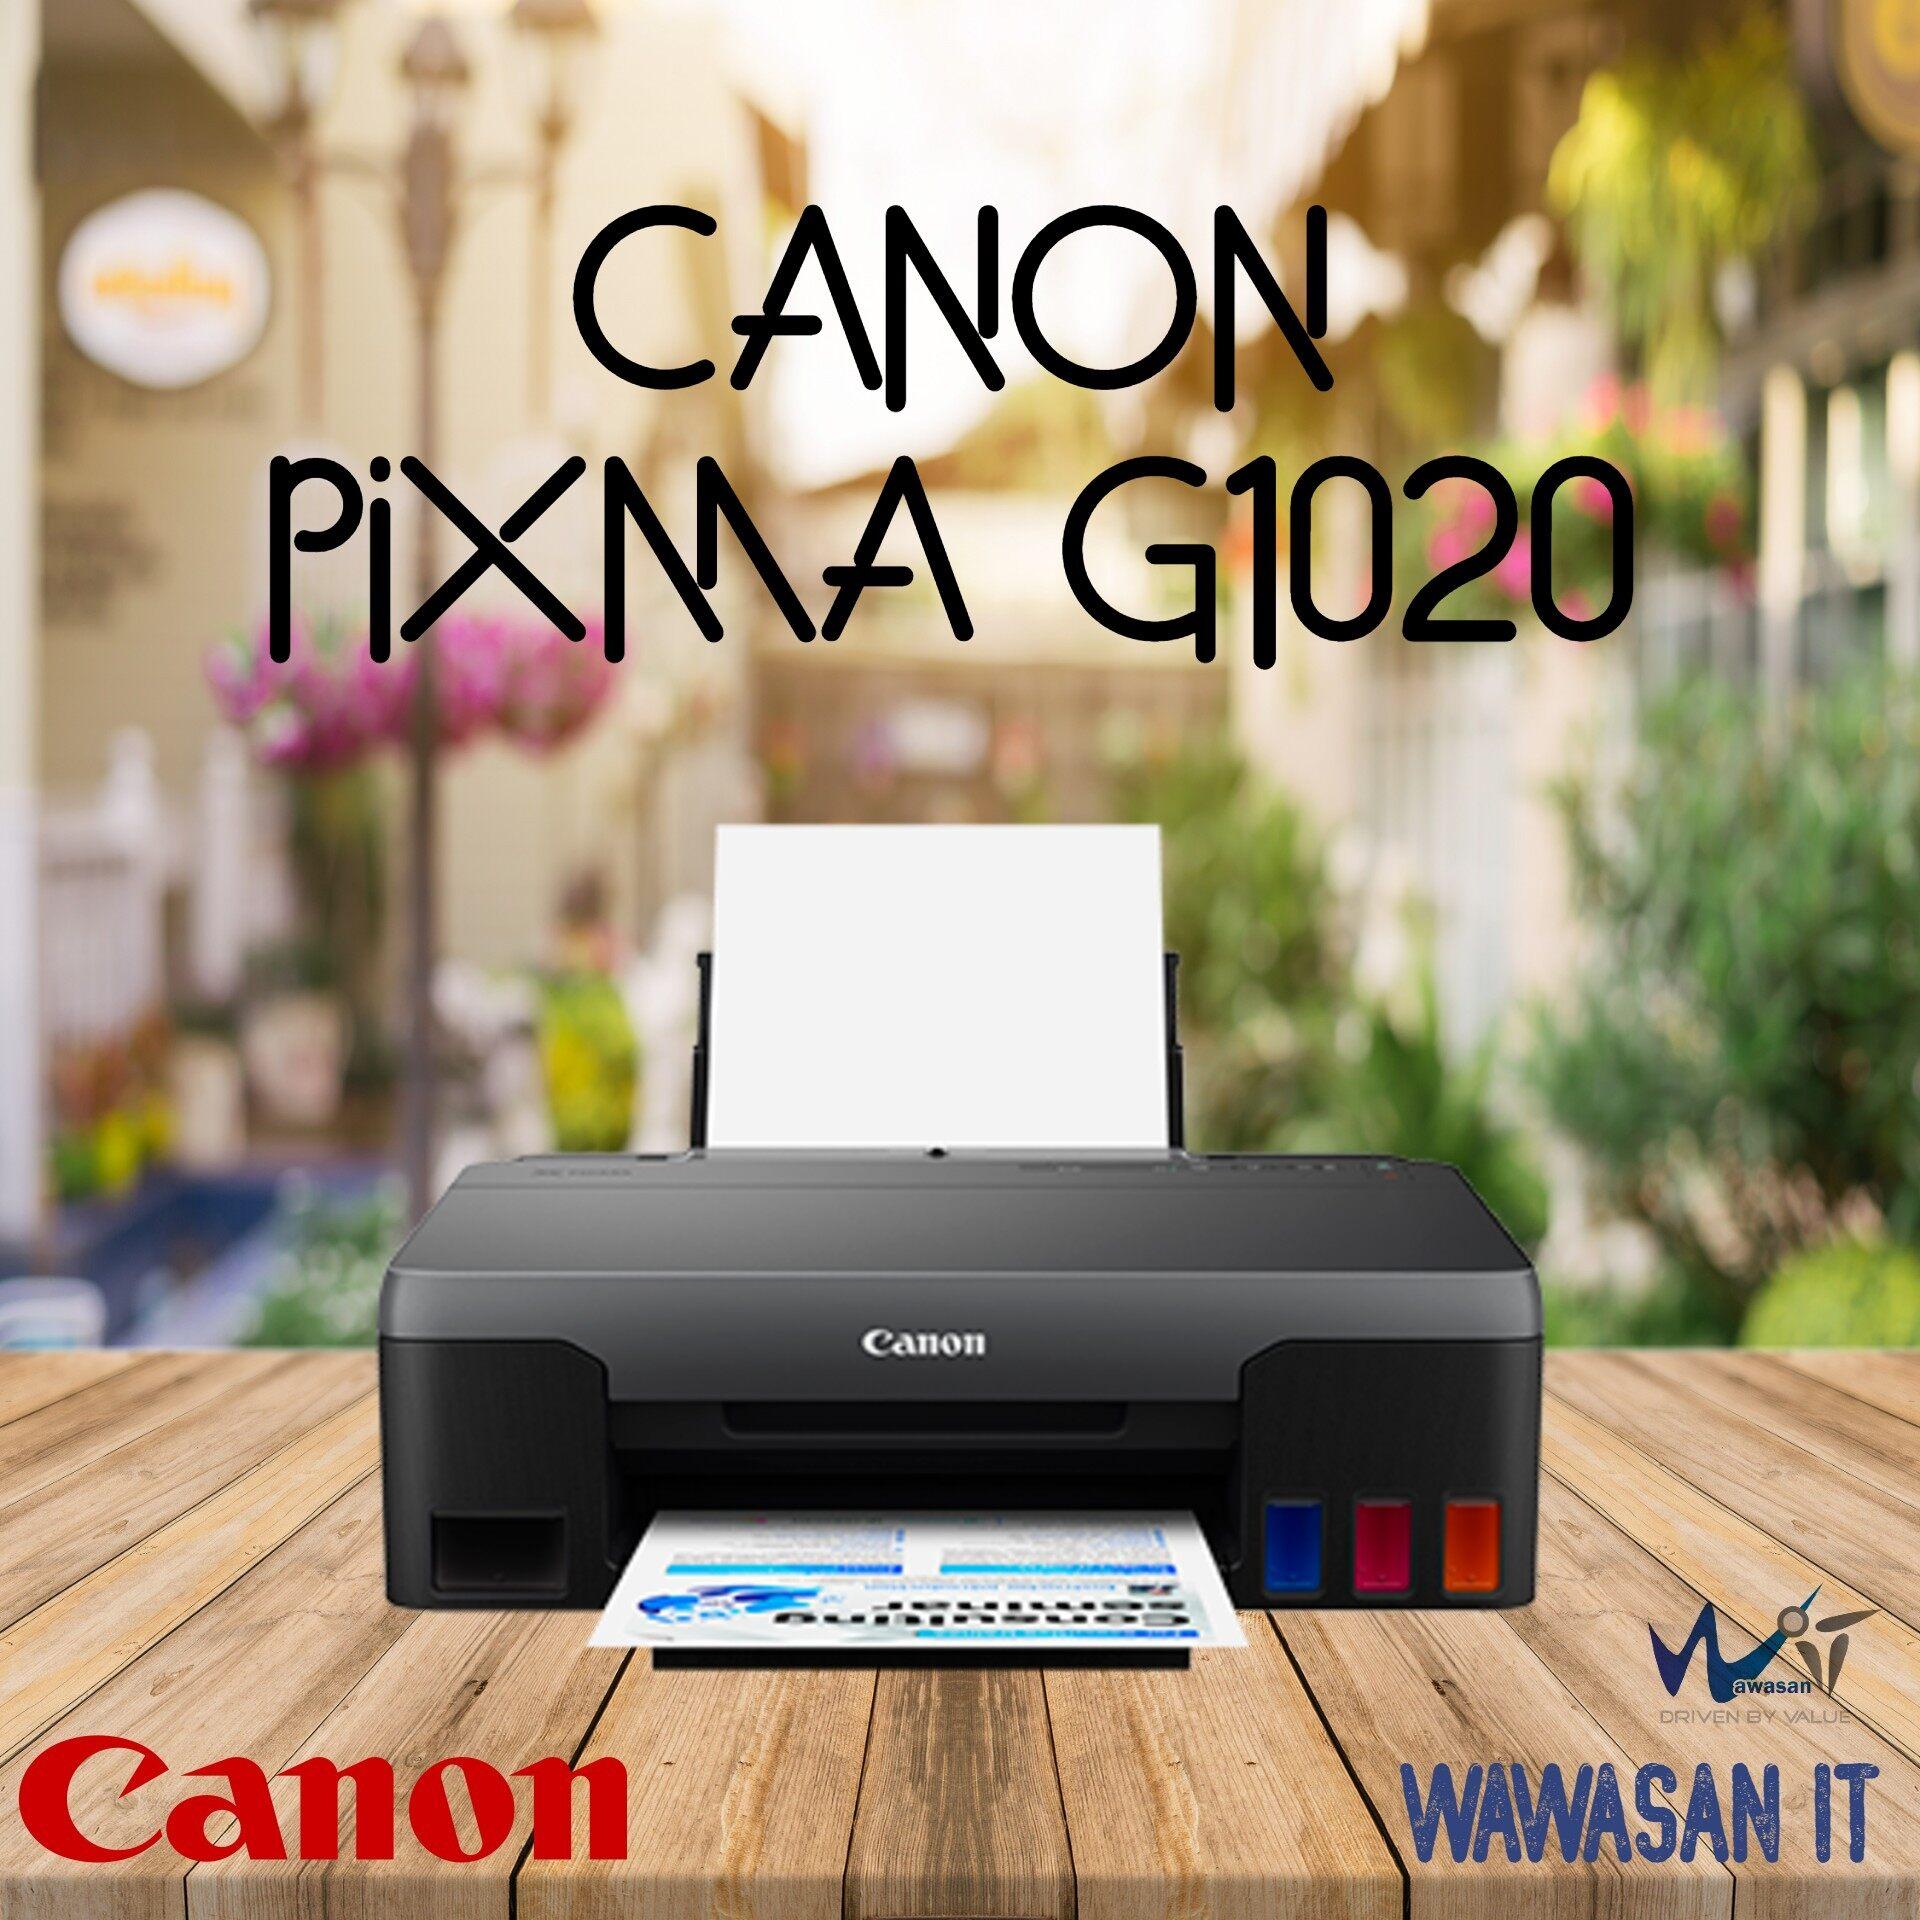 CANON PIXMA G1020 Refillable Ink Tank Printer for High Volume Printing